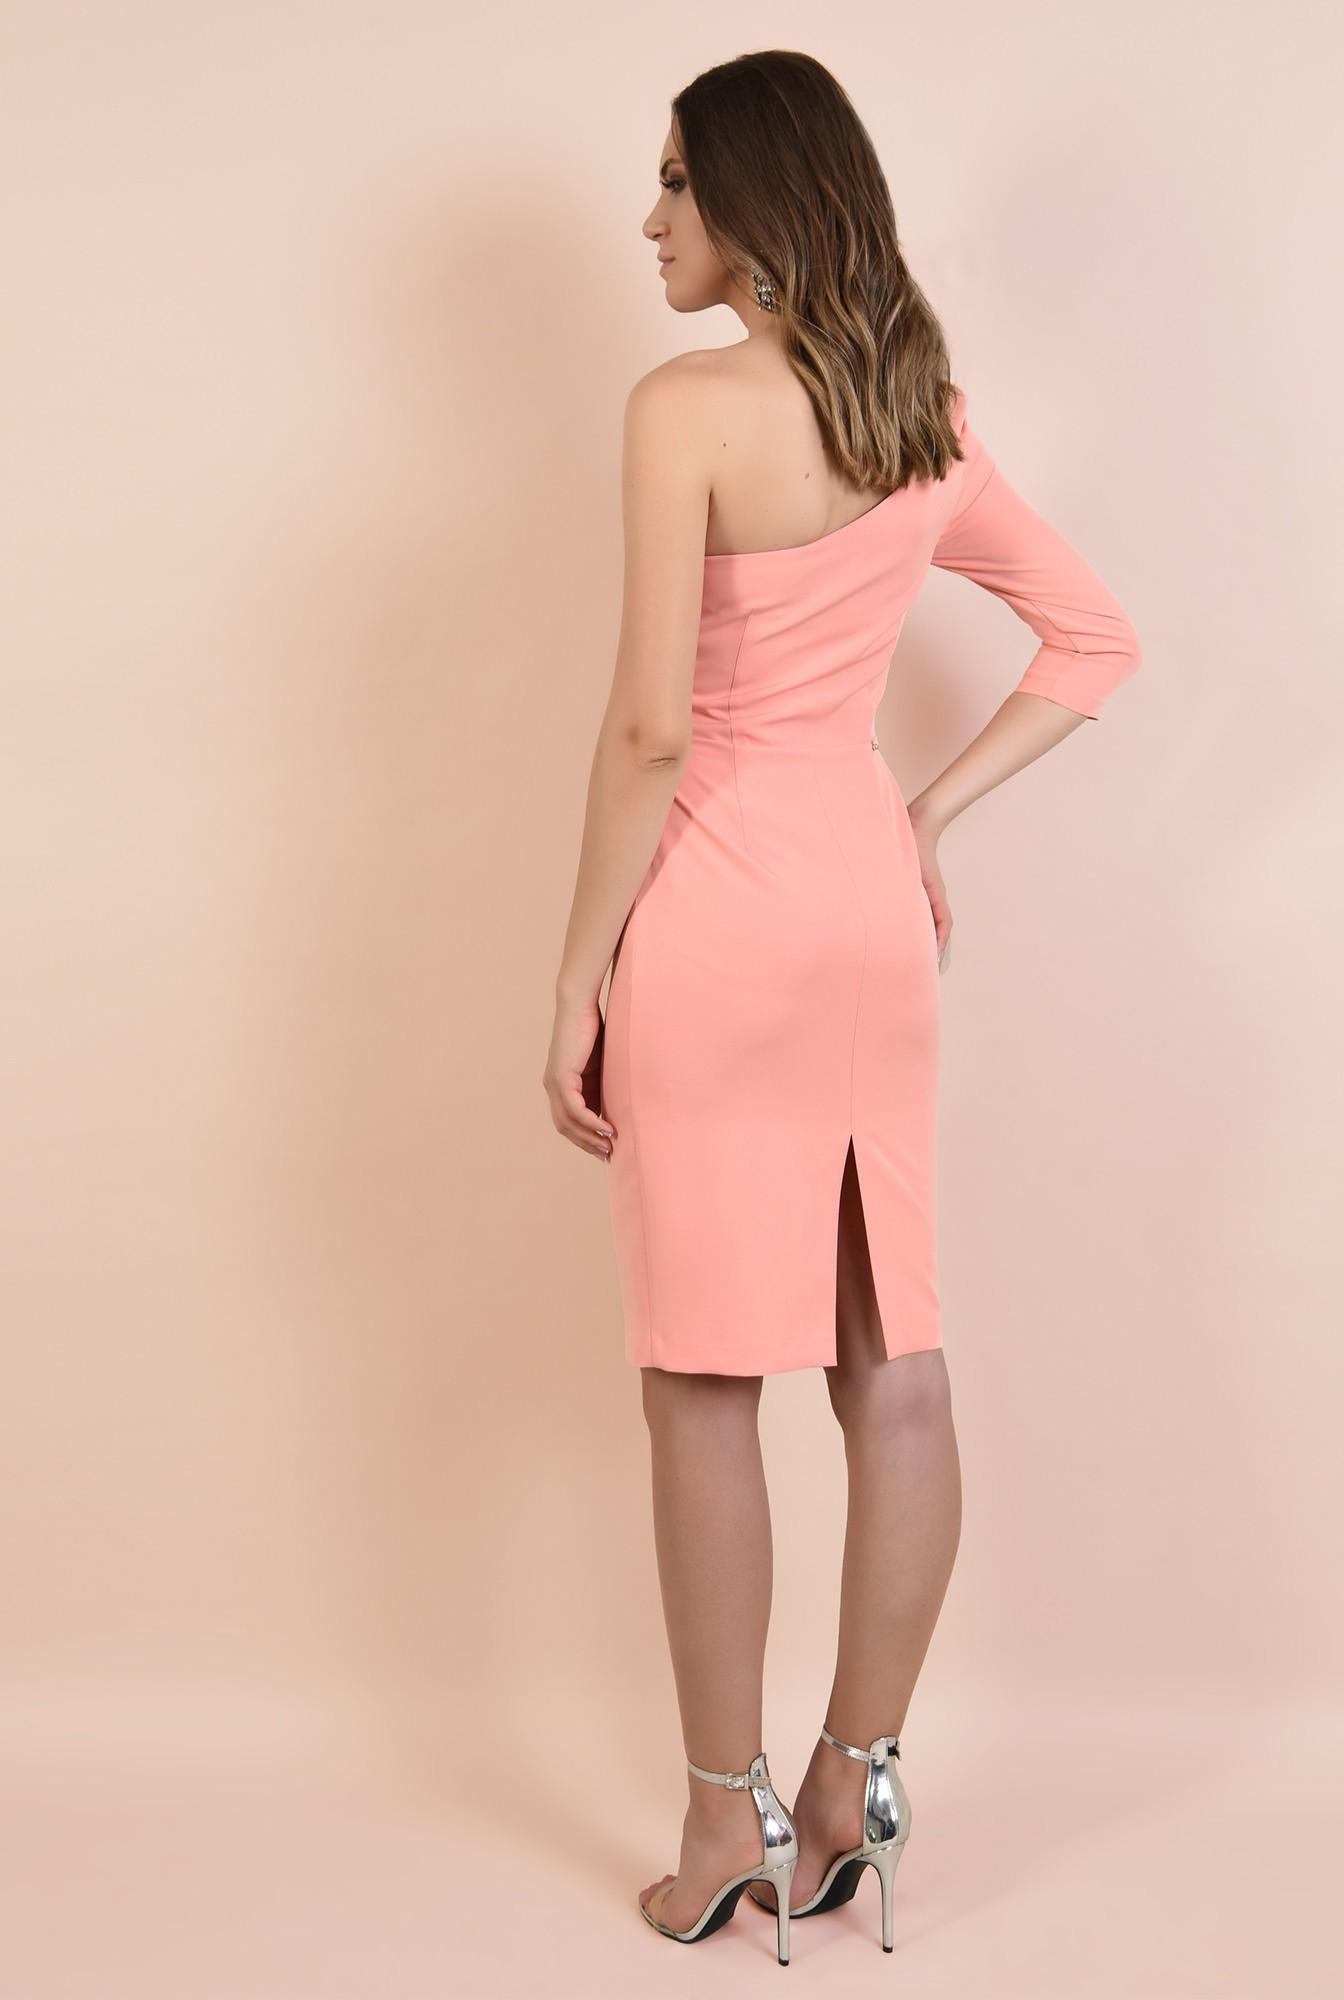 1 - rochie eleganta, decolteu inima, o maneca, croi conic, midi, Poema, roz somon